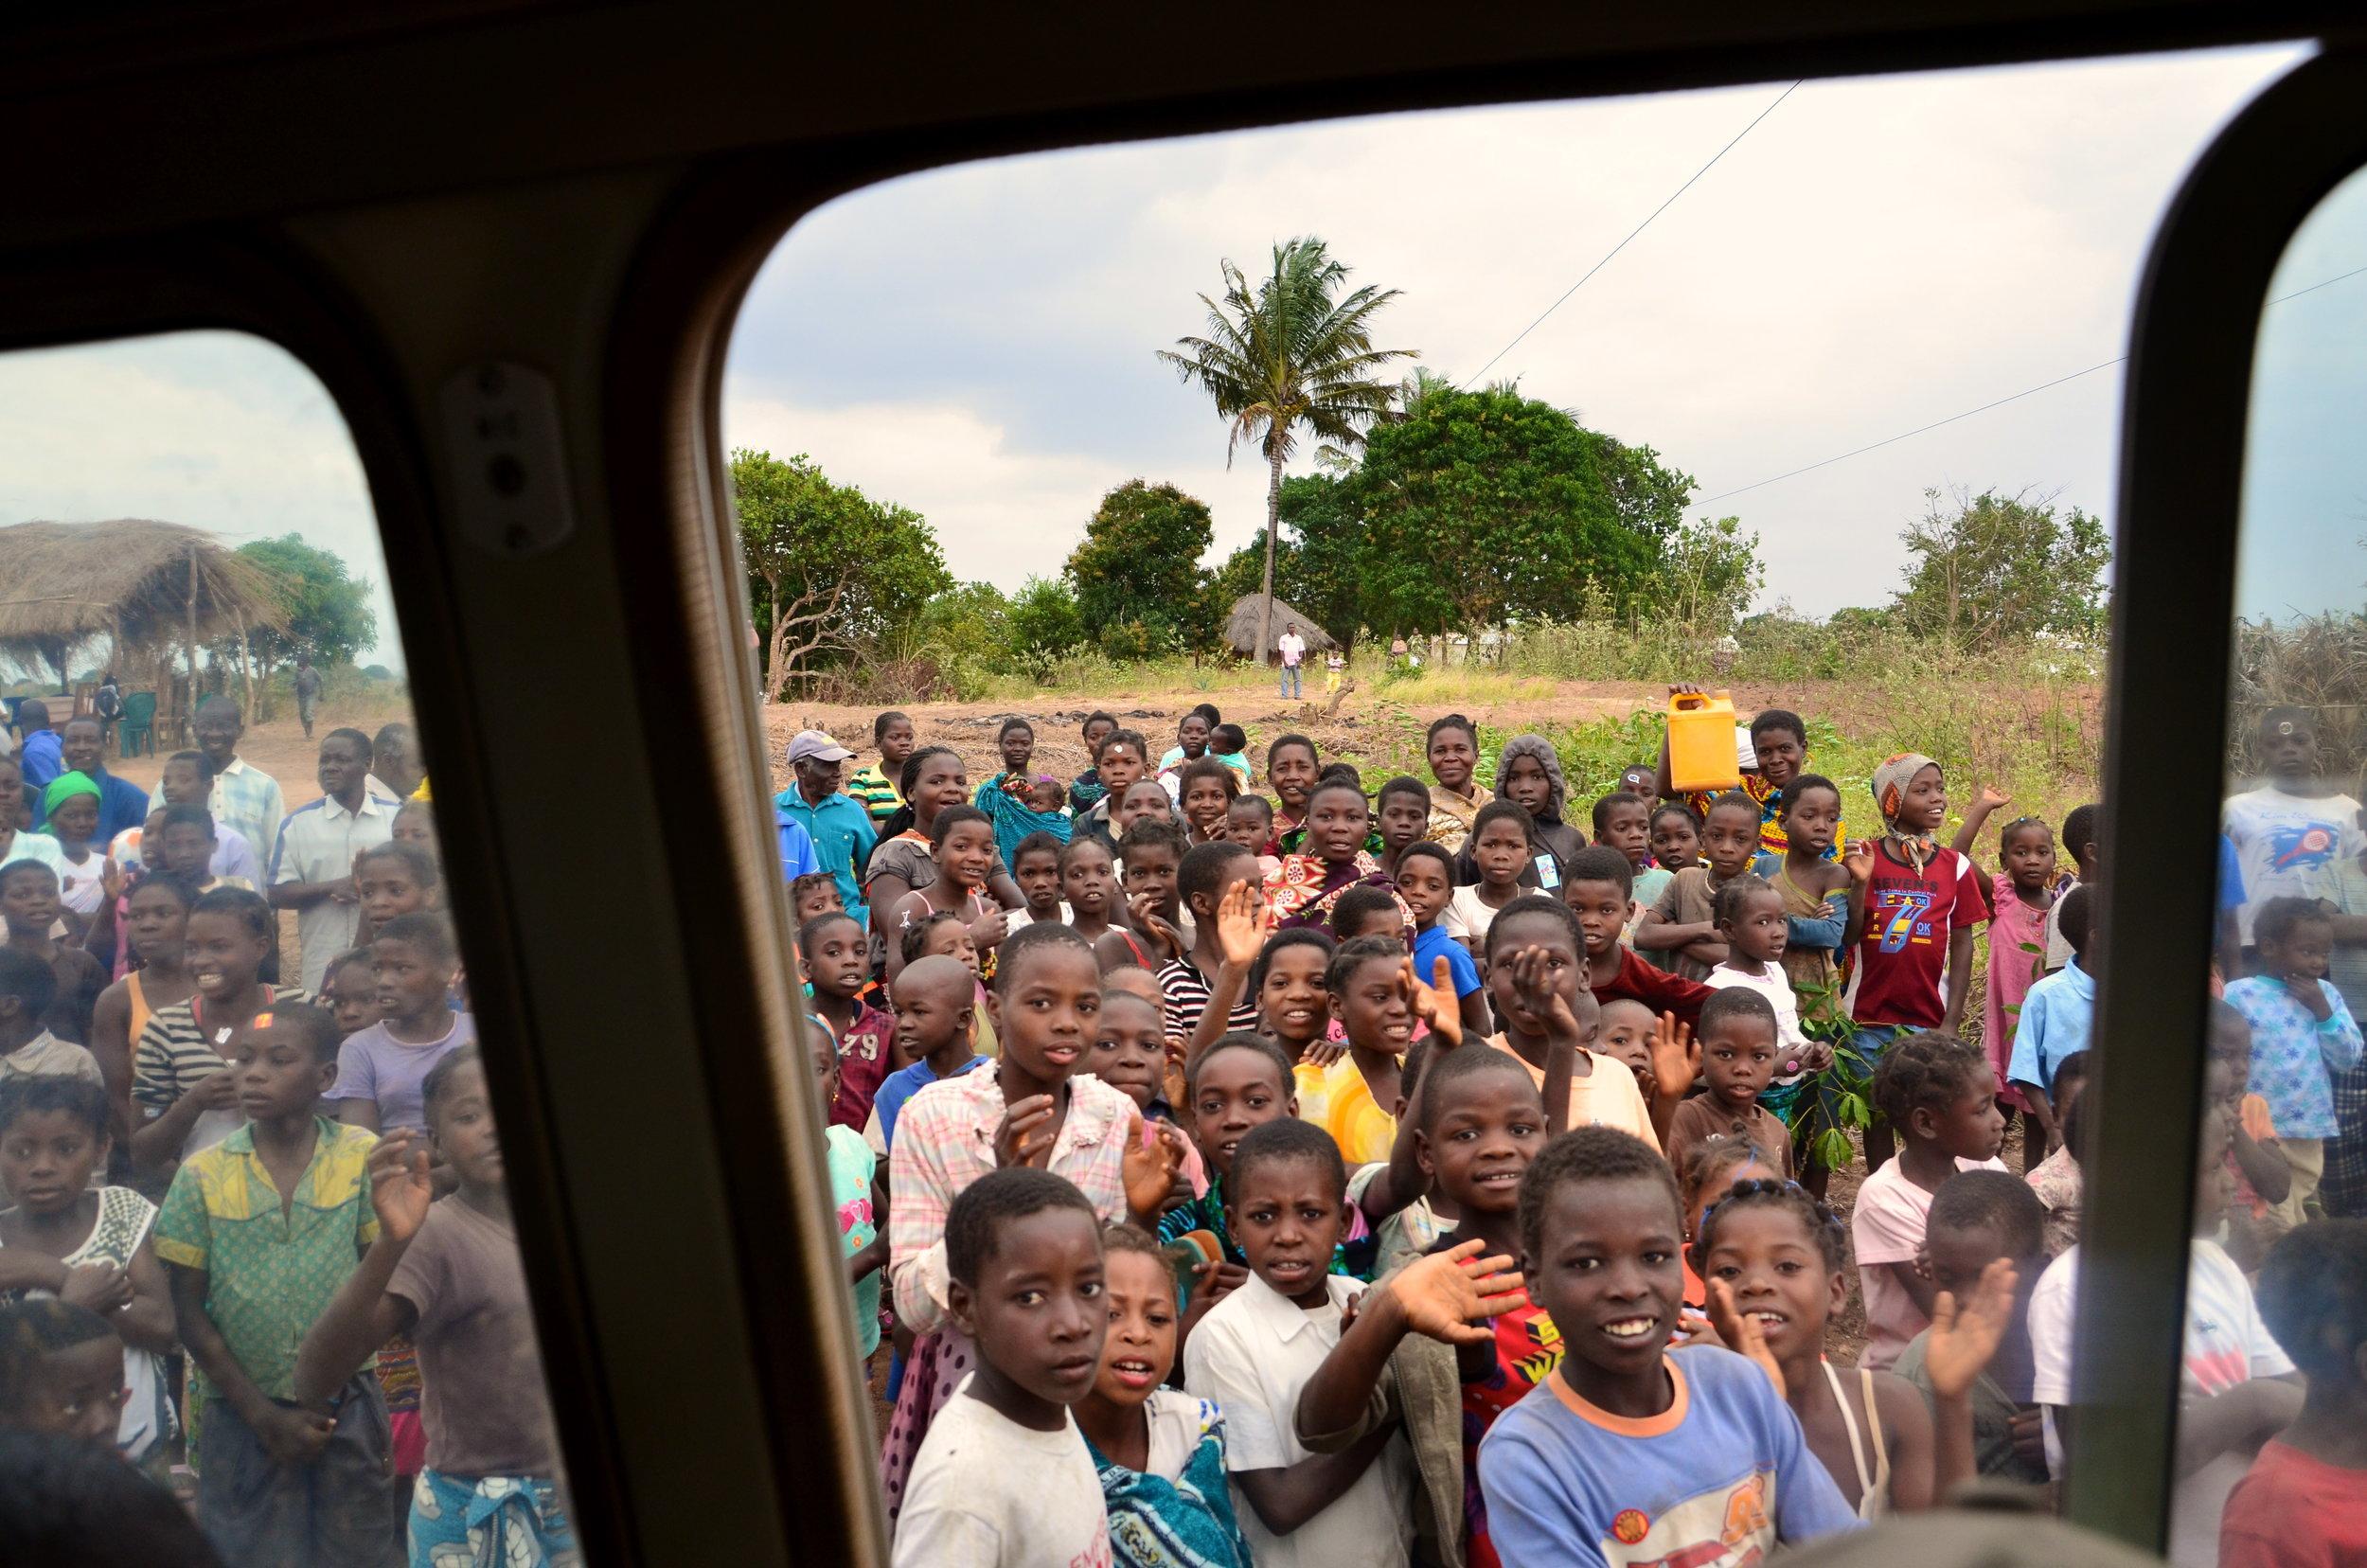 overcomer_covenant_church_occ_auburn_federal_way_seattle_WA_worship_center_missions_outreach_uganda_trip_0001.JPG